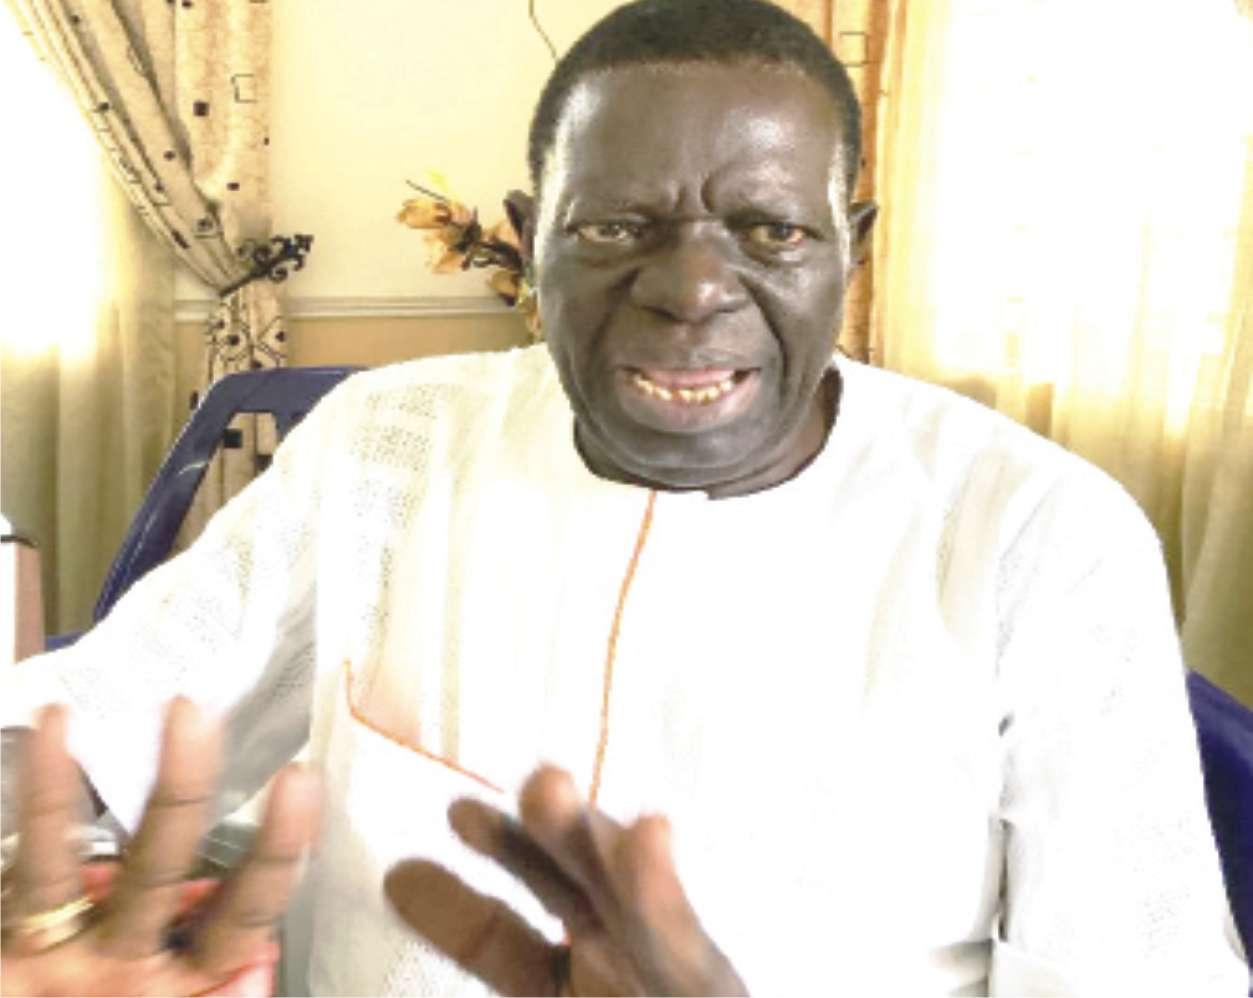 Senator Roland Owie12 - What Senator Owie said about probing MKO Abiola's death